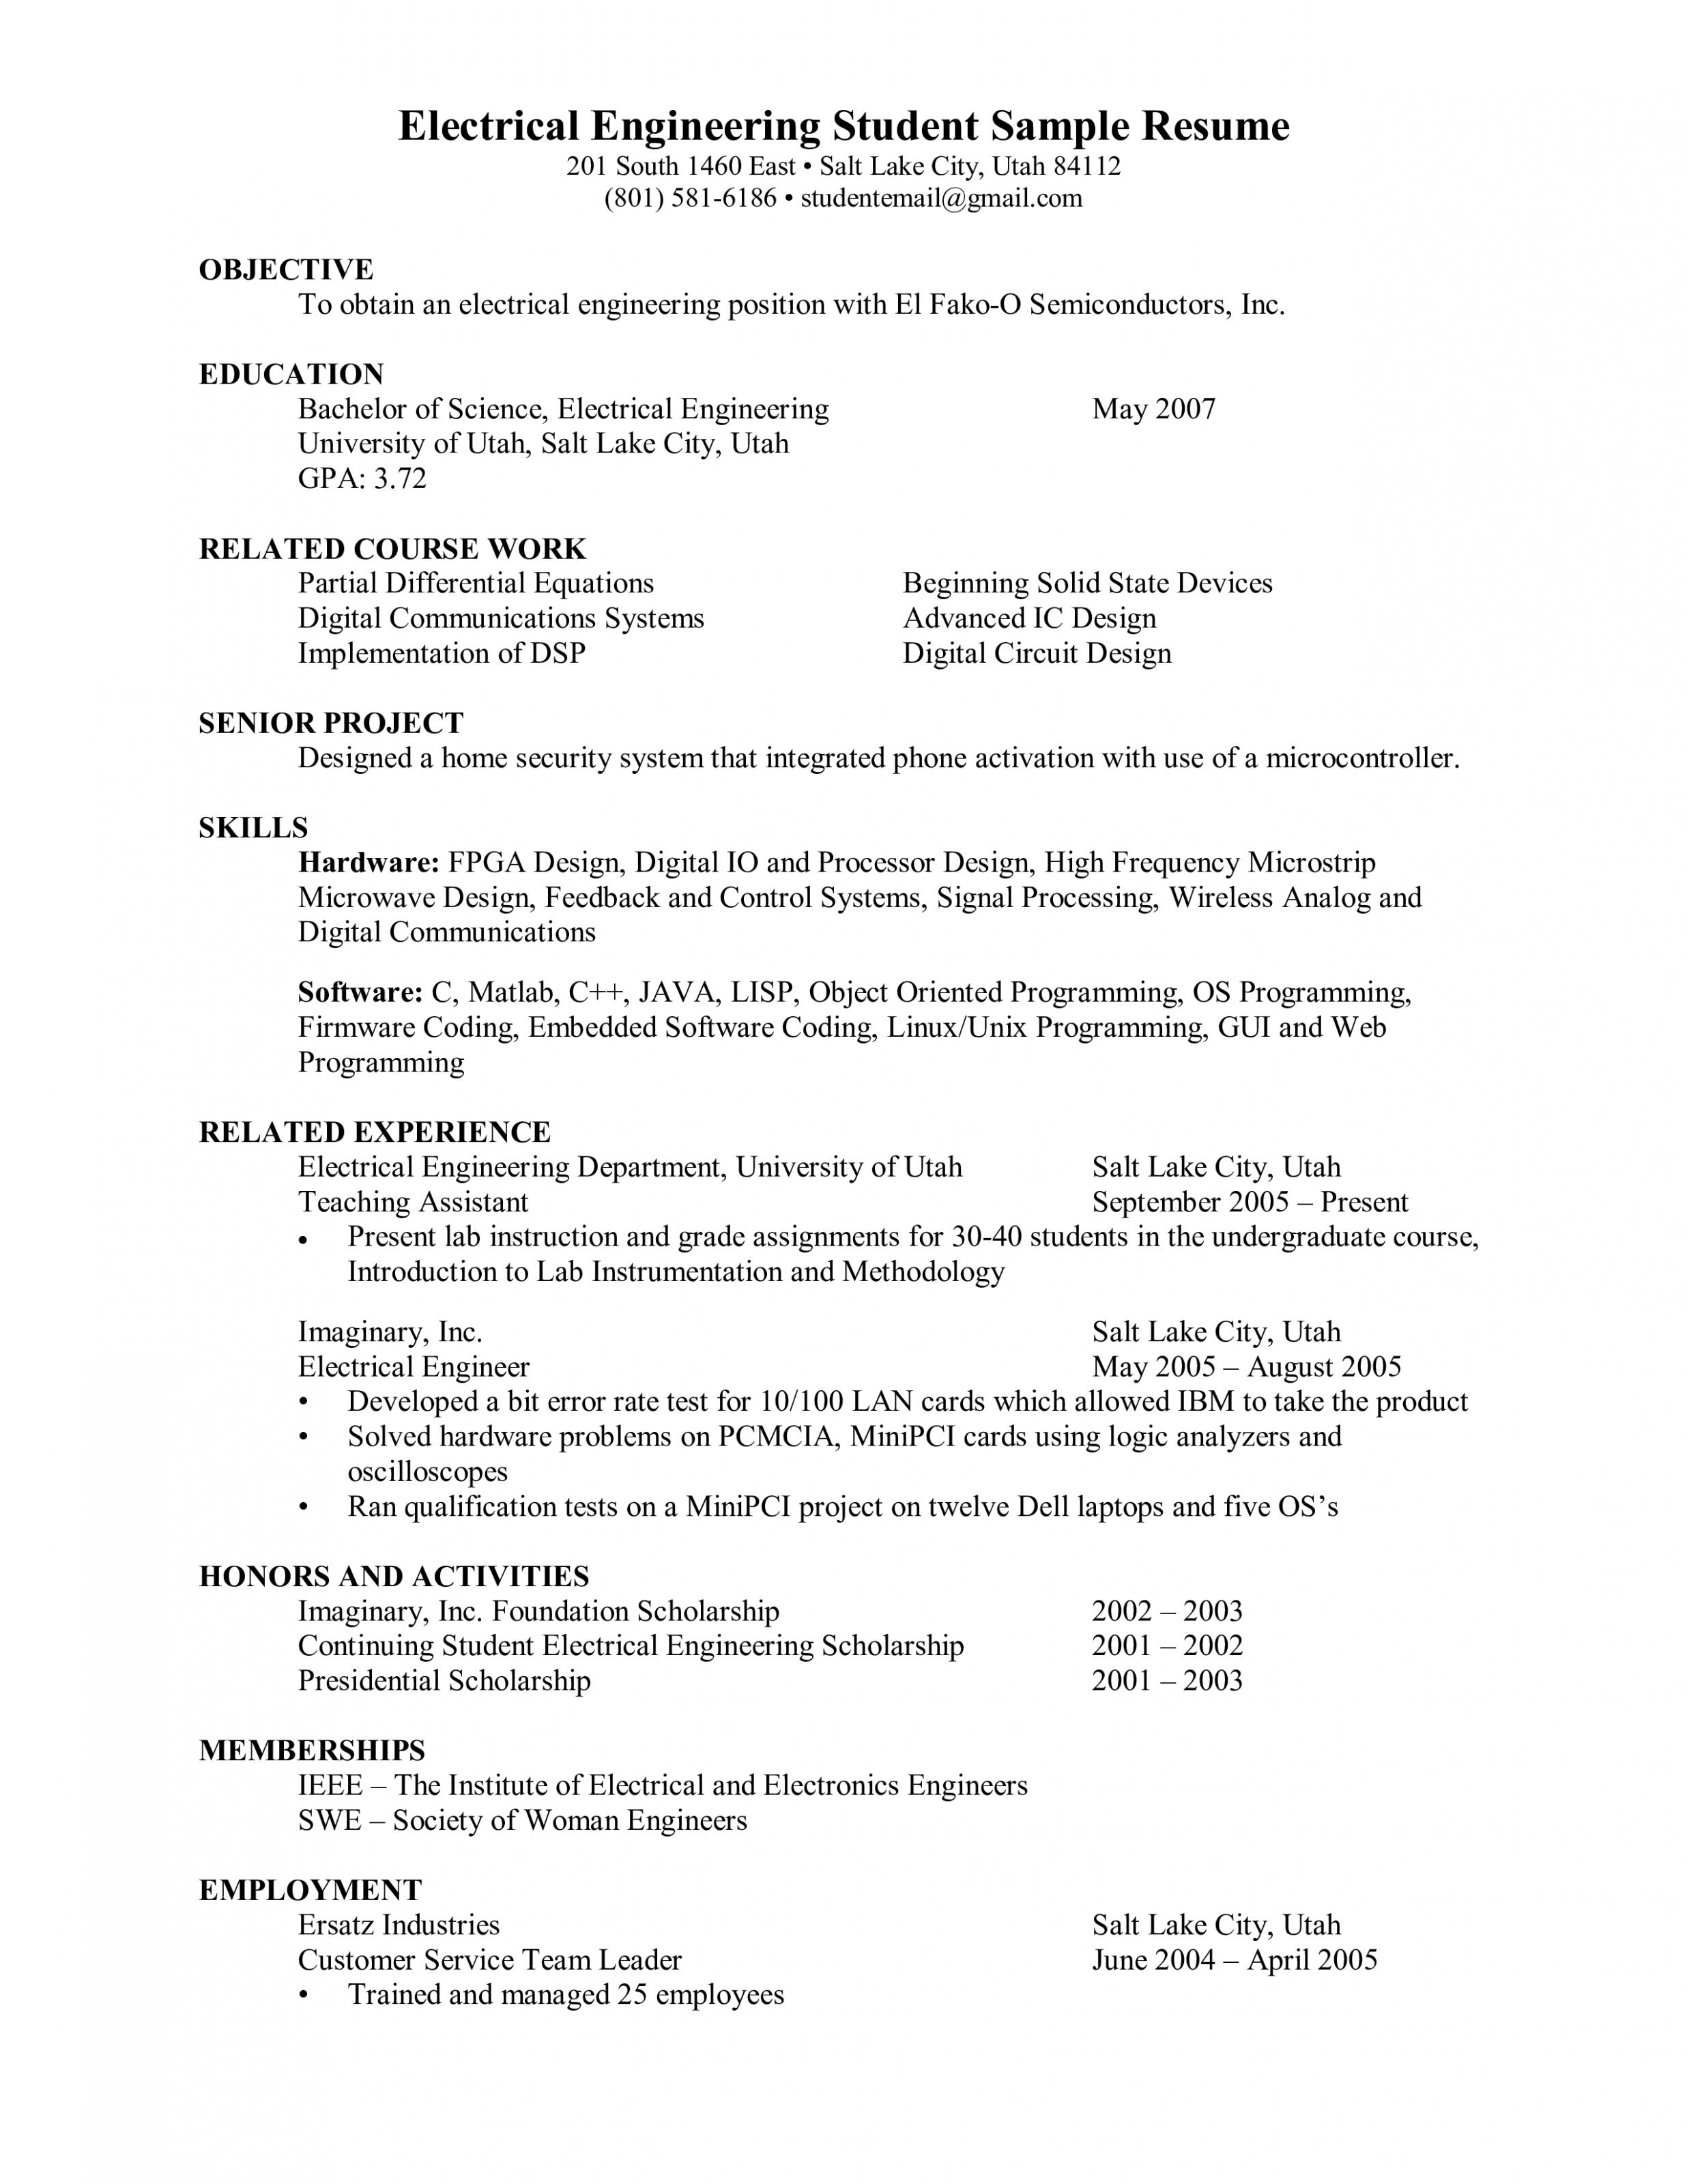 10 Engineer Resume Pattern For Freshers 10 Engineer Resume